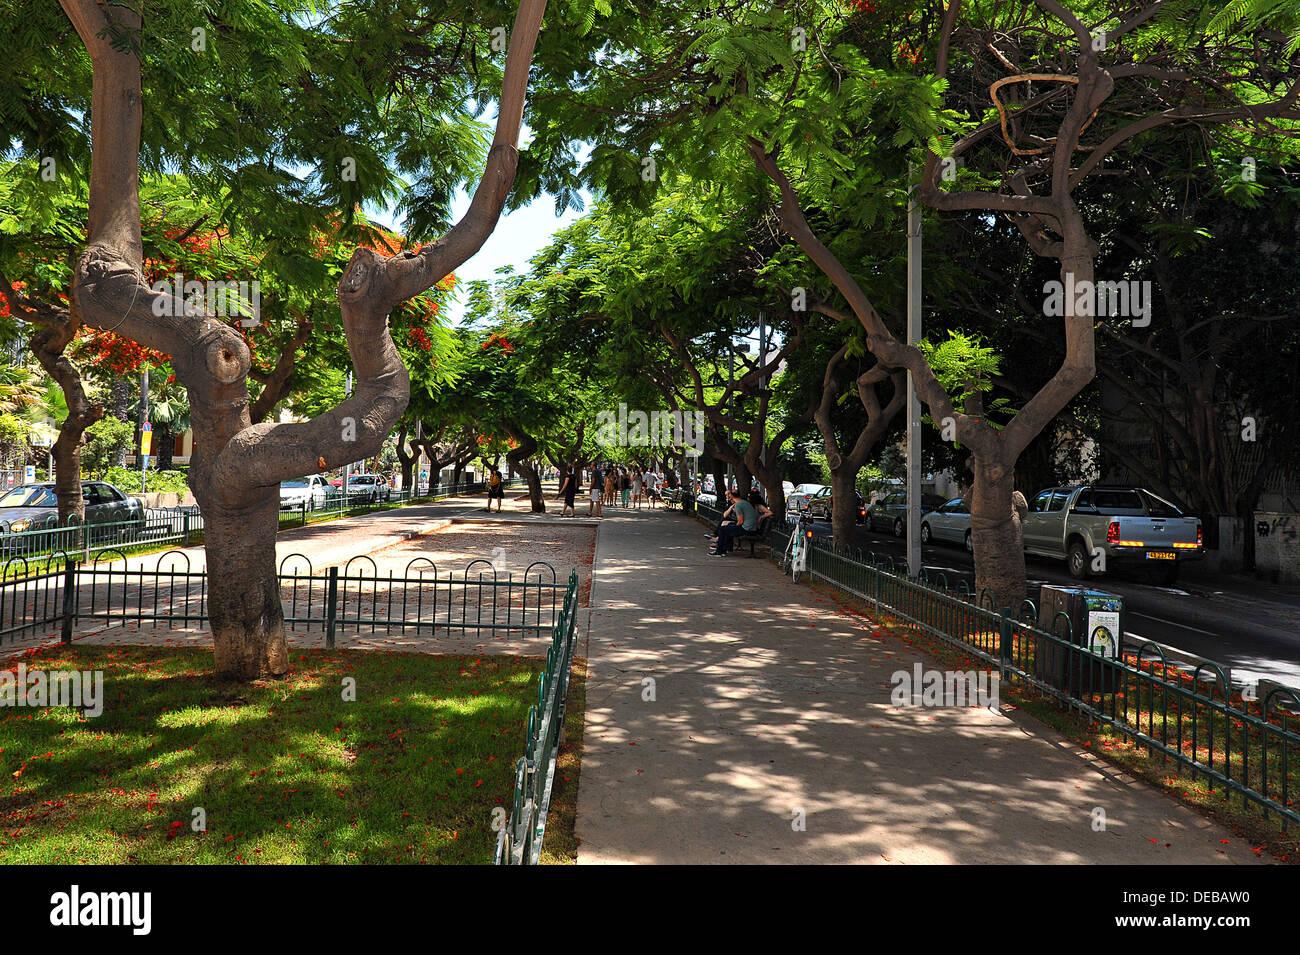 A section in Rothschild Boulevard, Tel Aviv, Israel - Stock Image